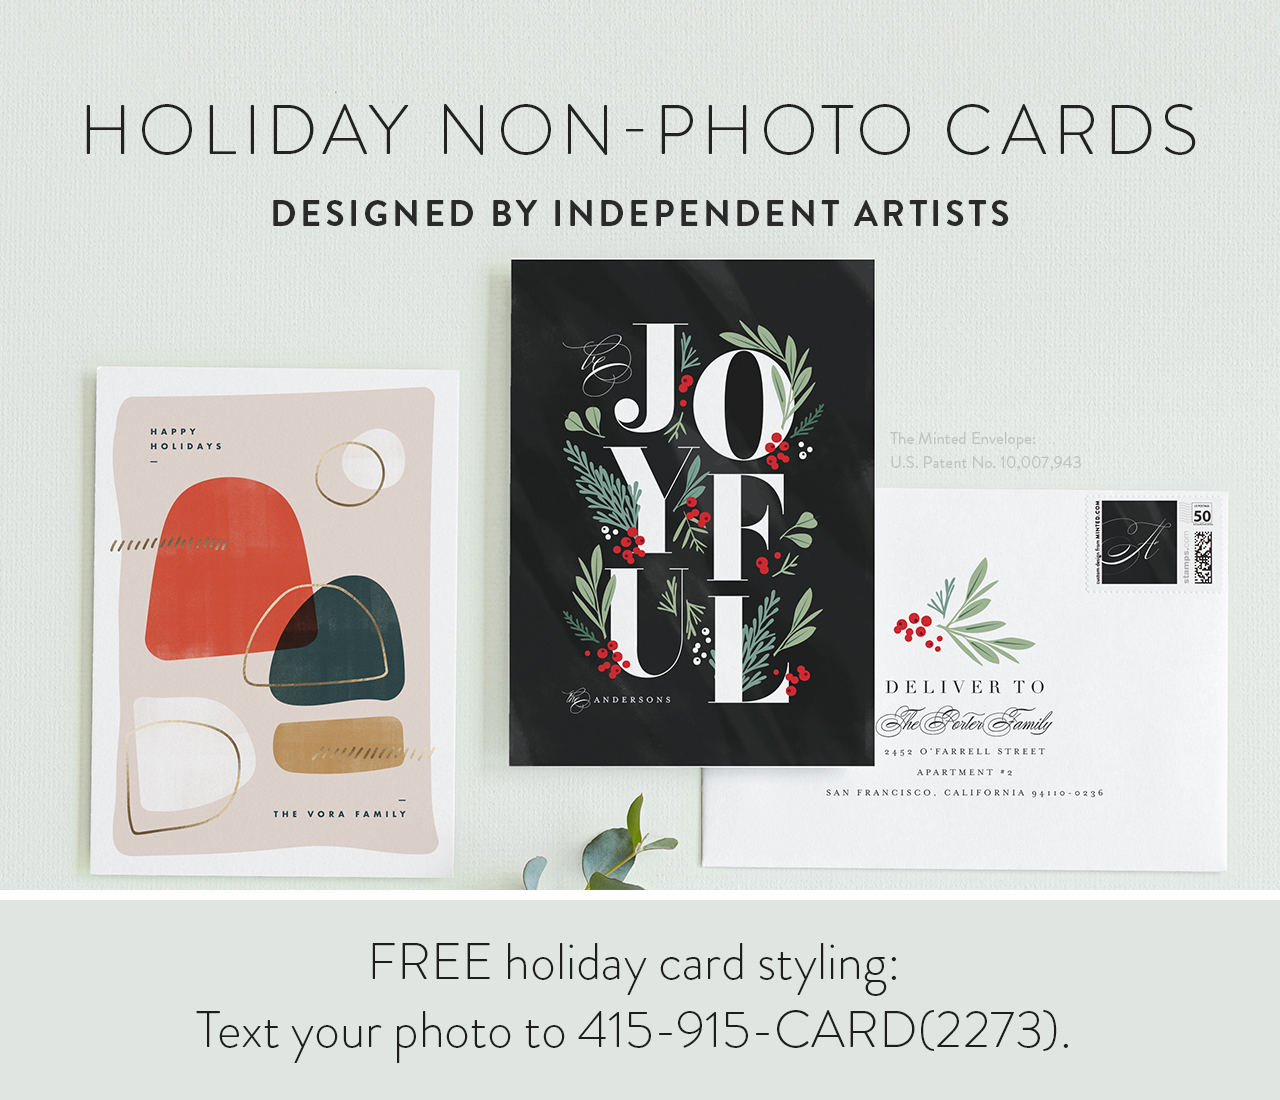 Holiday Non-Photo Cards